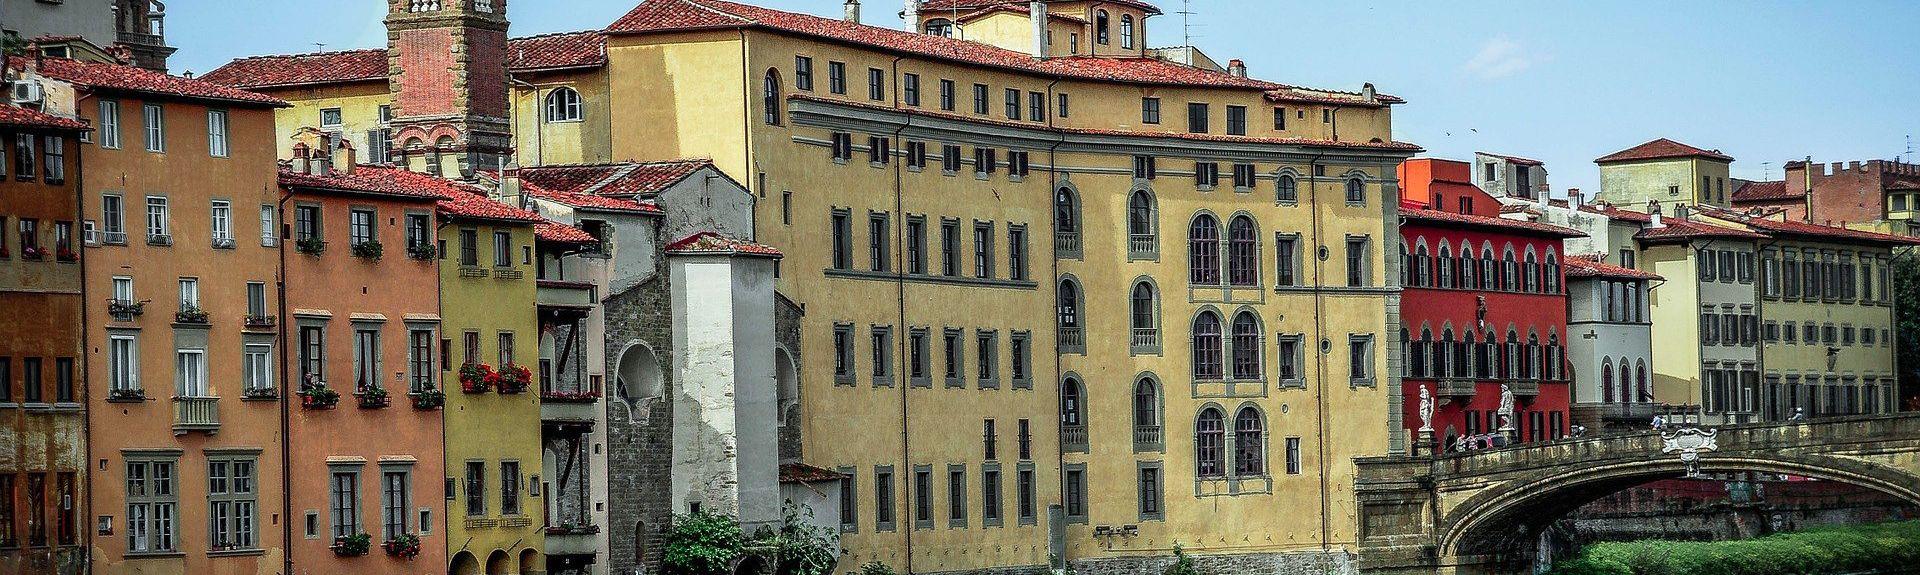 Montespertoli, Toscana, Italia